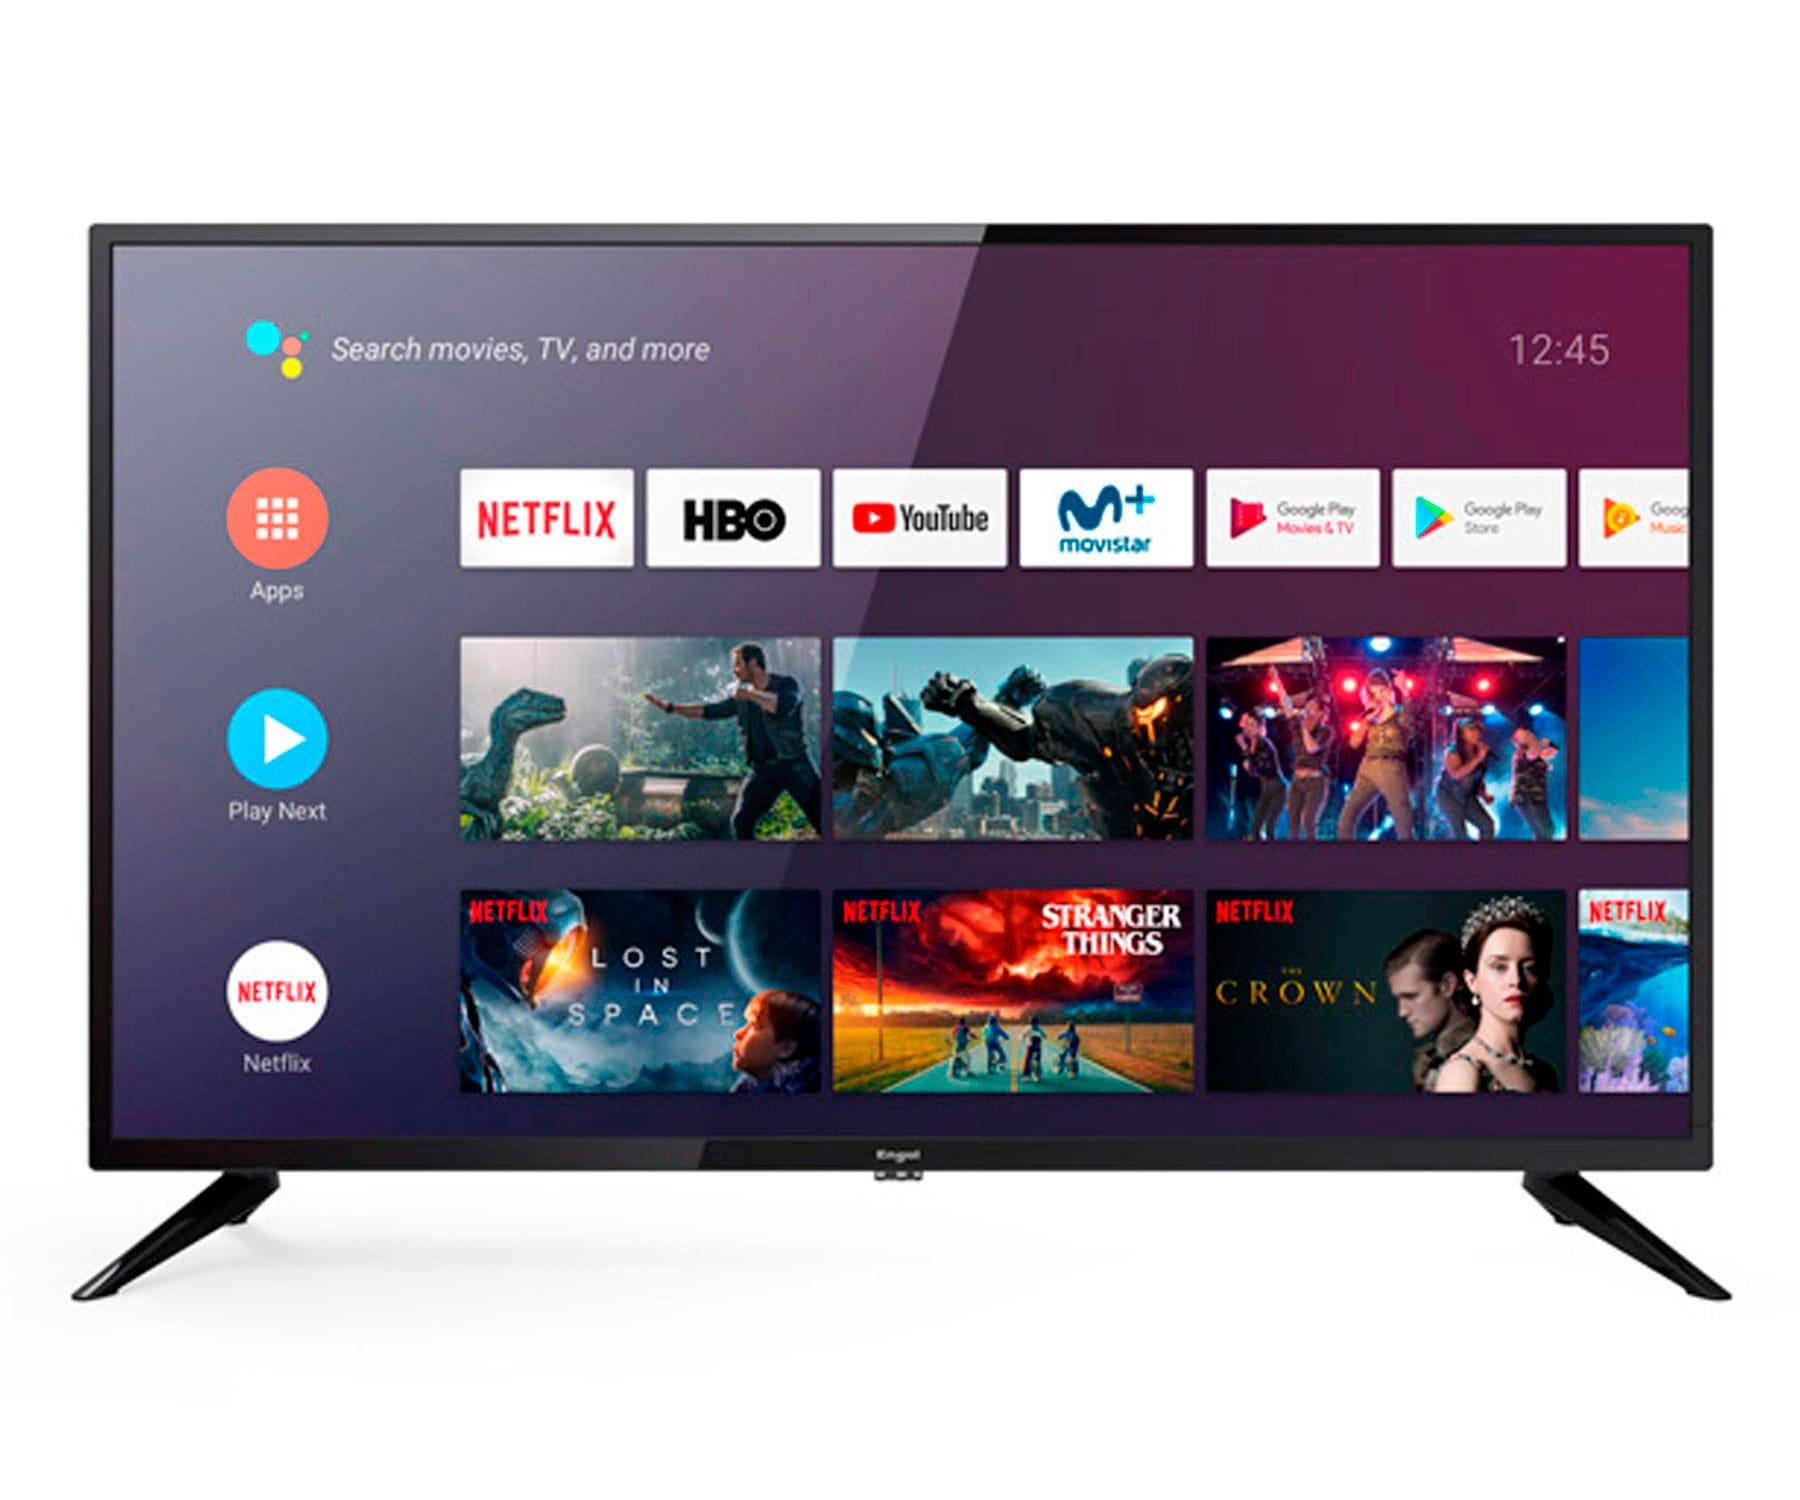 ENGEL 40LE4090ATV TELEVISOR 40'' IPS LED FULLHD WIFI HDMI USB ANDROID TV GOOGLE ASSISTANT CHROMECAST